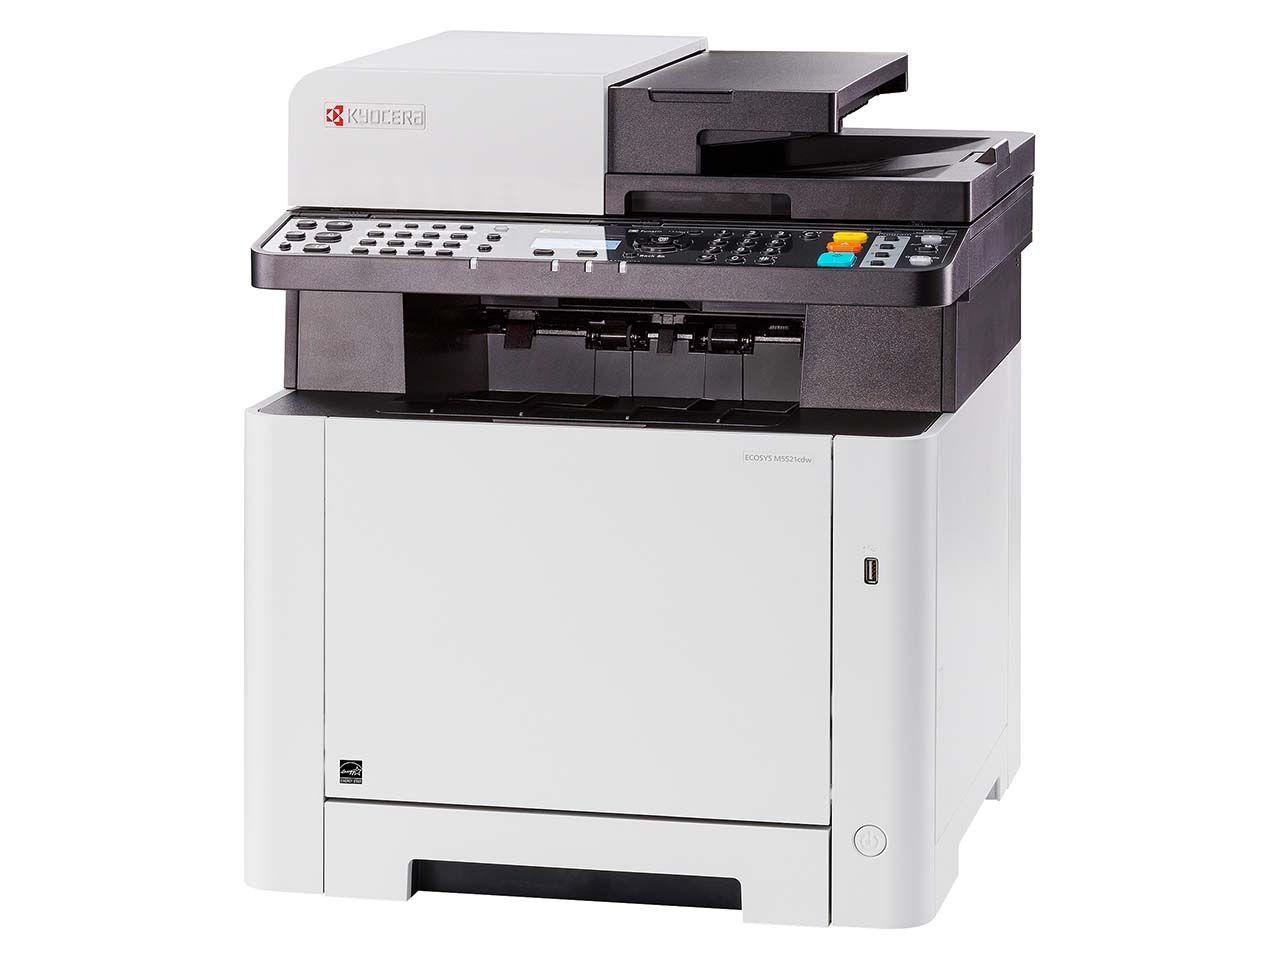 "Kyocera Farblaser-Multifunktionsdrucker ""ECOSYS M5521cdw"" 1102R93NL0"